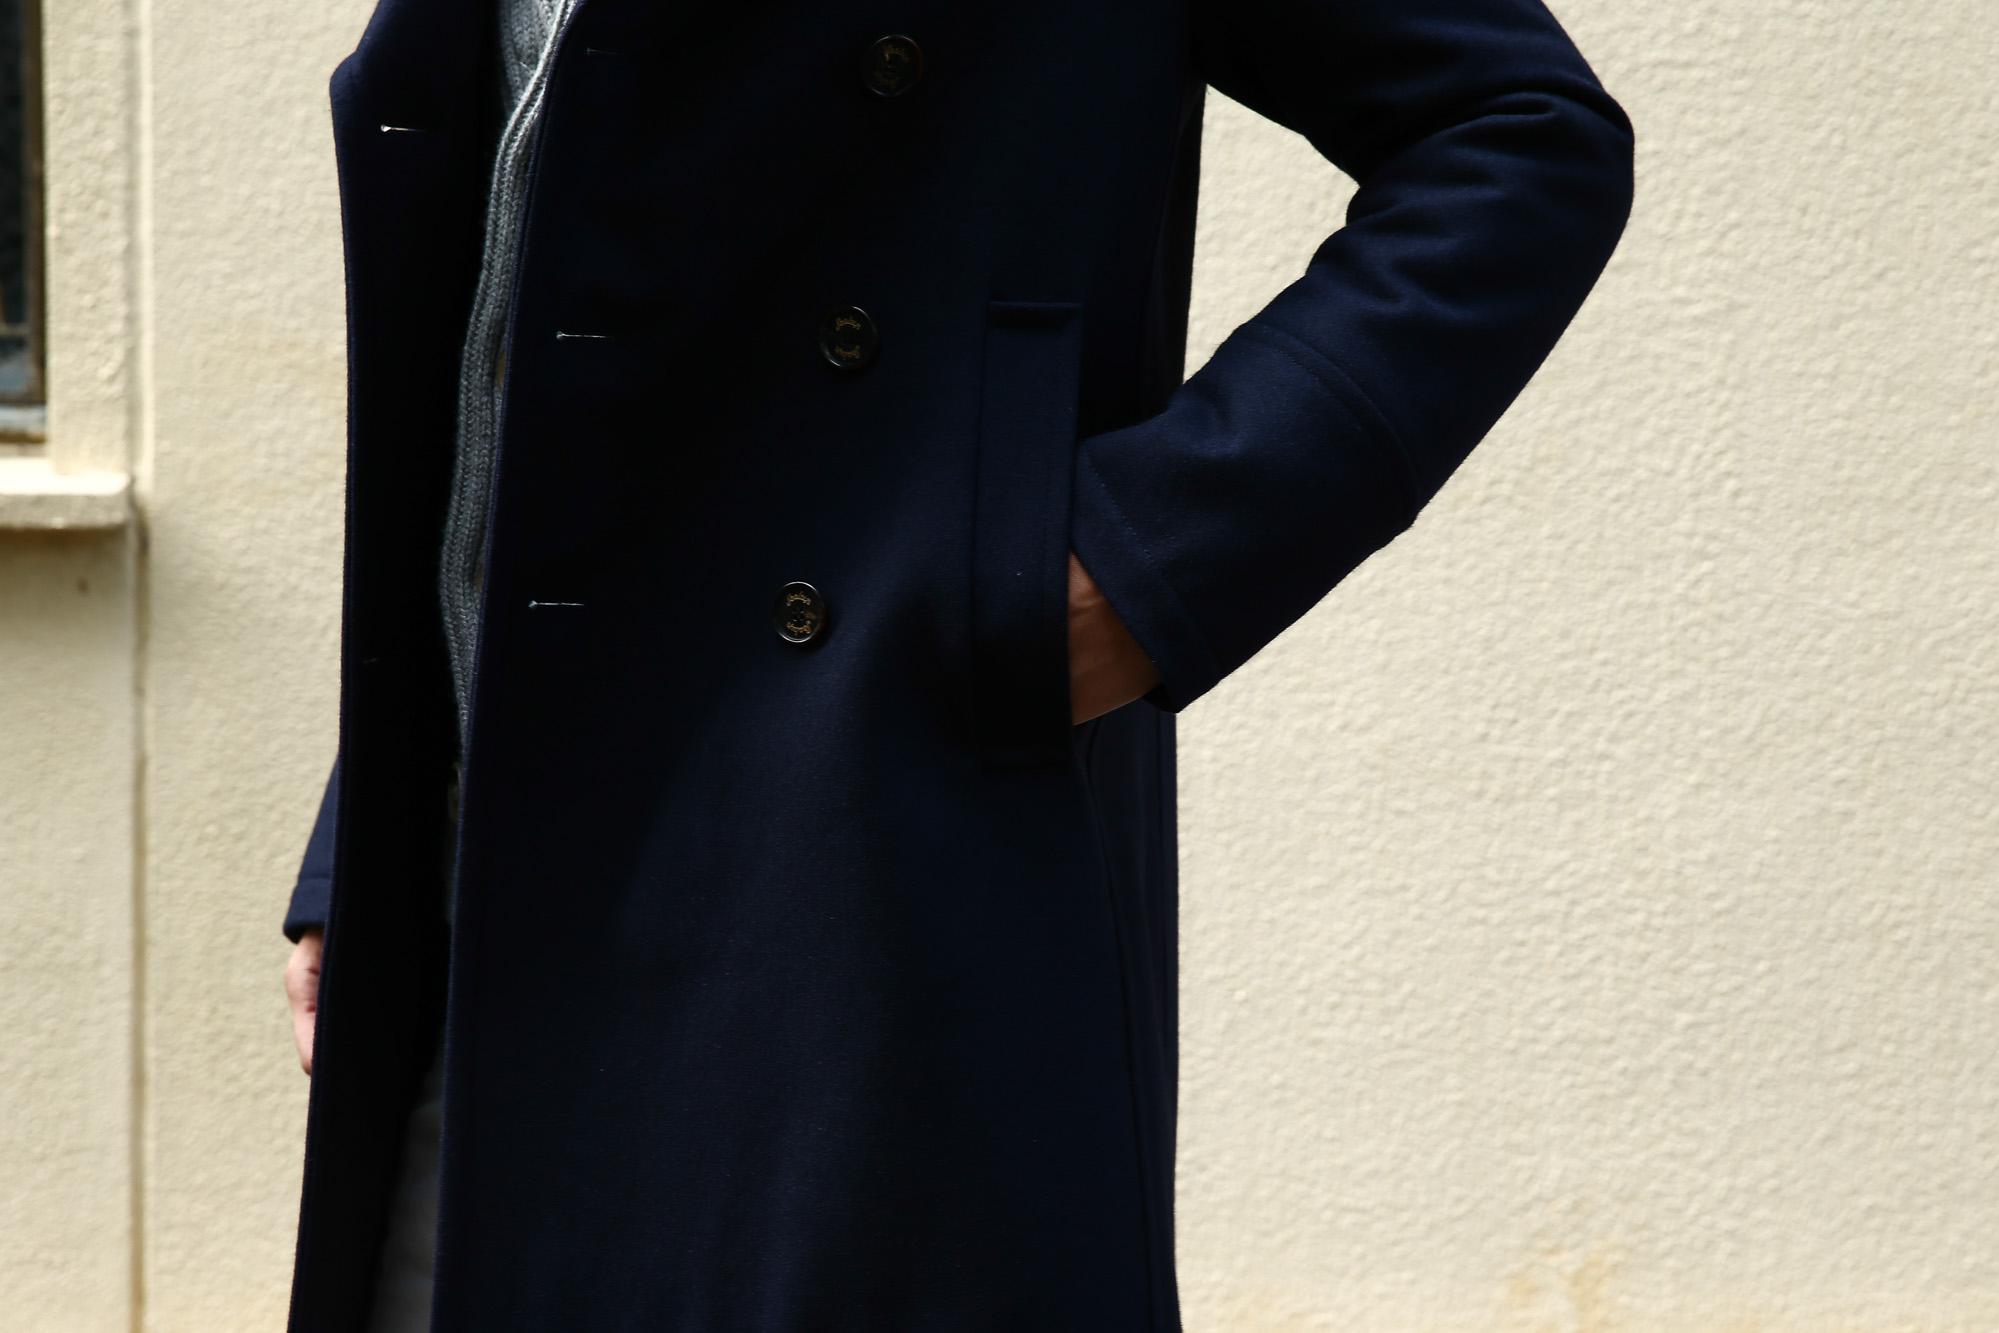 Sealup (シーラップ) GENOVA ジェノバ 50002JAP 7591 01 サーモアライニング メルトンウール Pコート ロングピーコート NAVY (ネイビー・01) MADE IN ITALY(イタリア製) 2016 秋冬新作 のコーディネート画像。愛知 名古屋 ZODIAC ゾディアック シーラップ